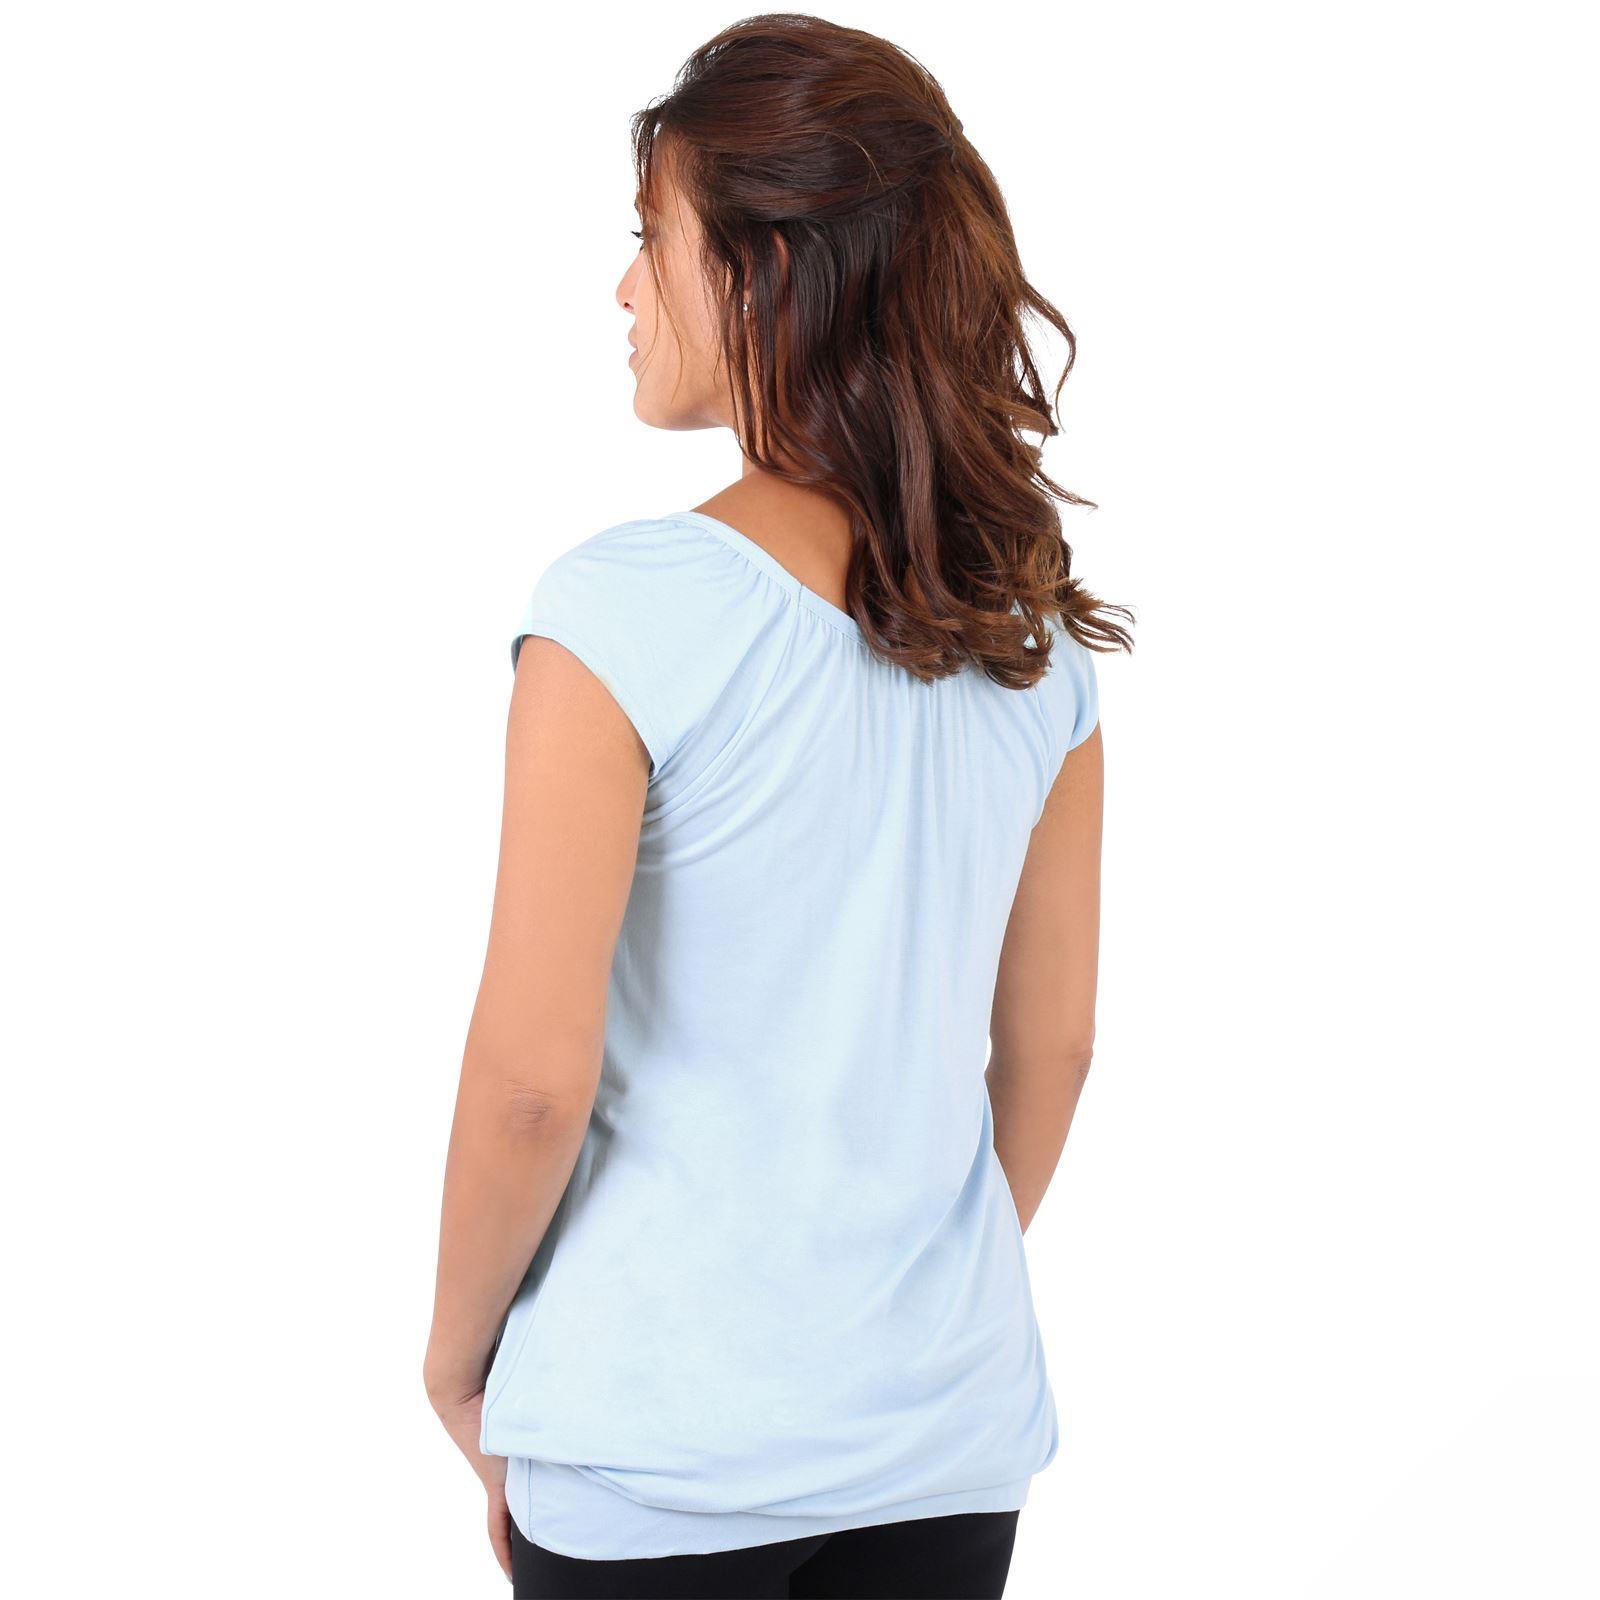 Womens-Ladies-Plain-T-Shirt-Short-Sleeve-Long-Loose-V-Neck-Blouse-Tunic-Top thumbnail 5